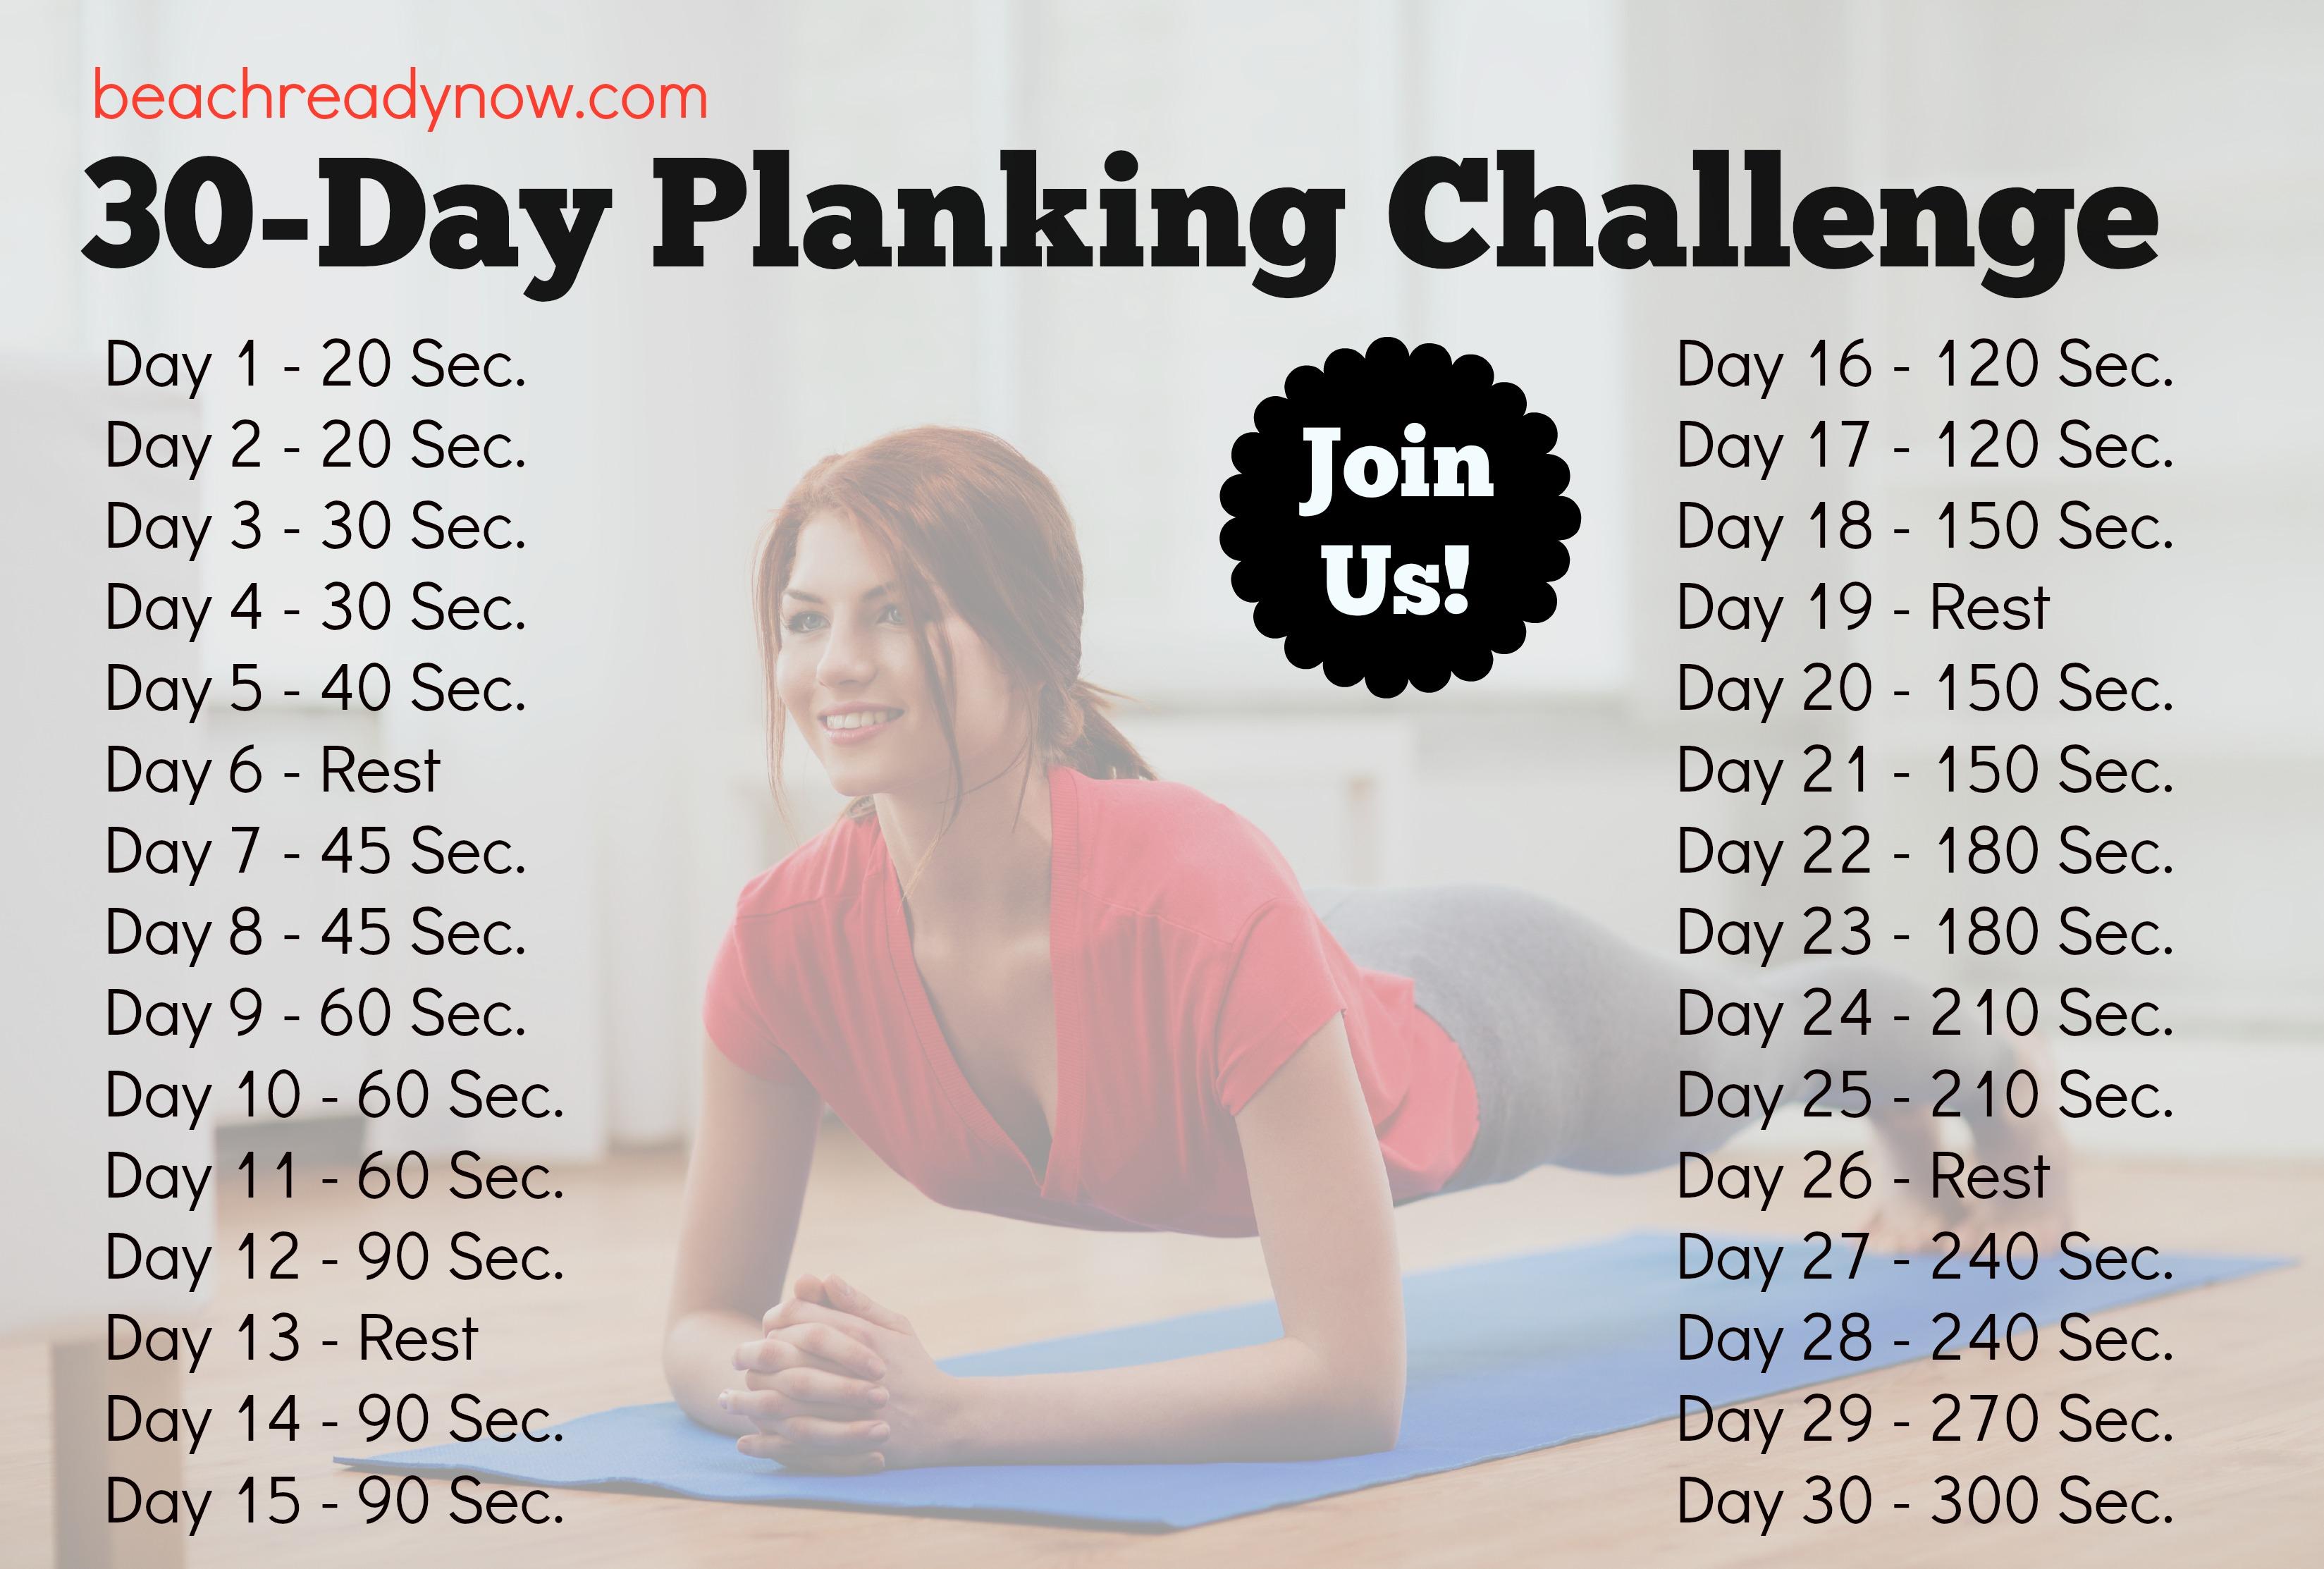 30-Day Planking Challenge